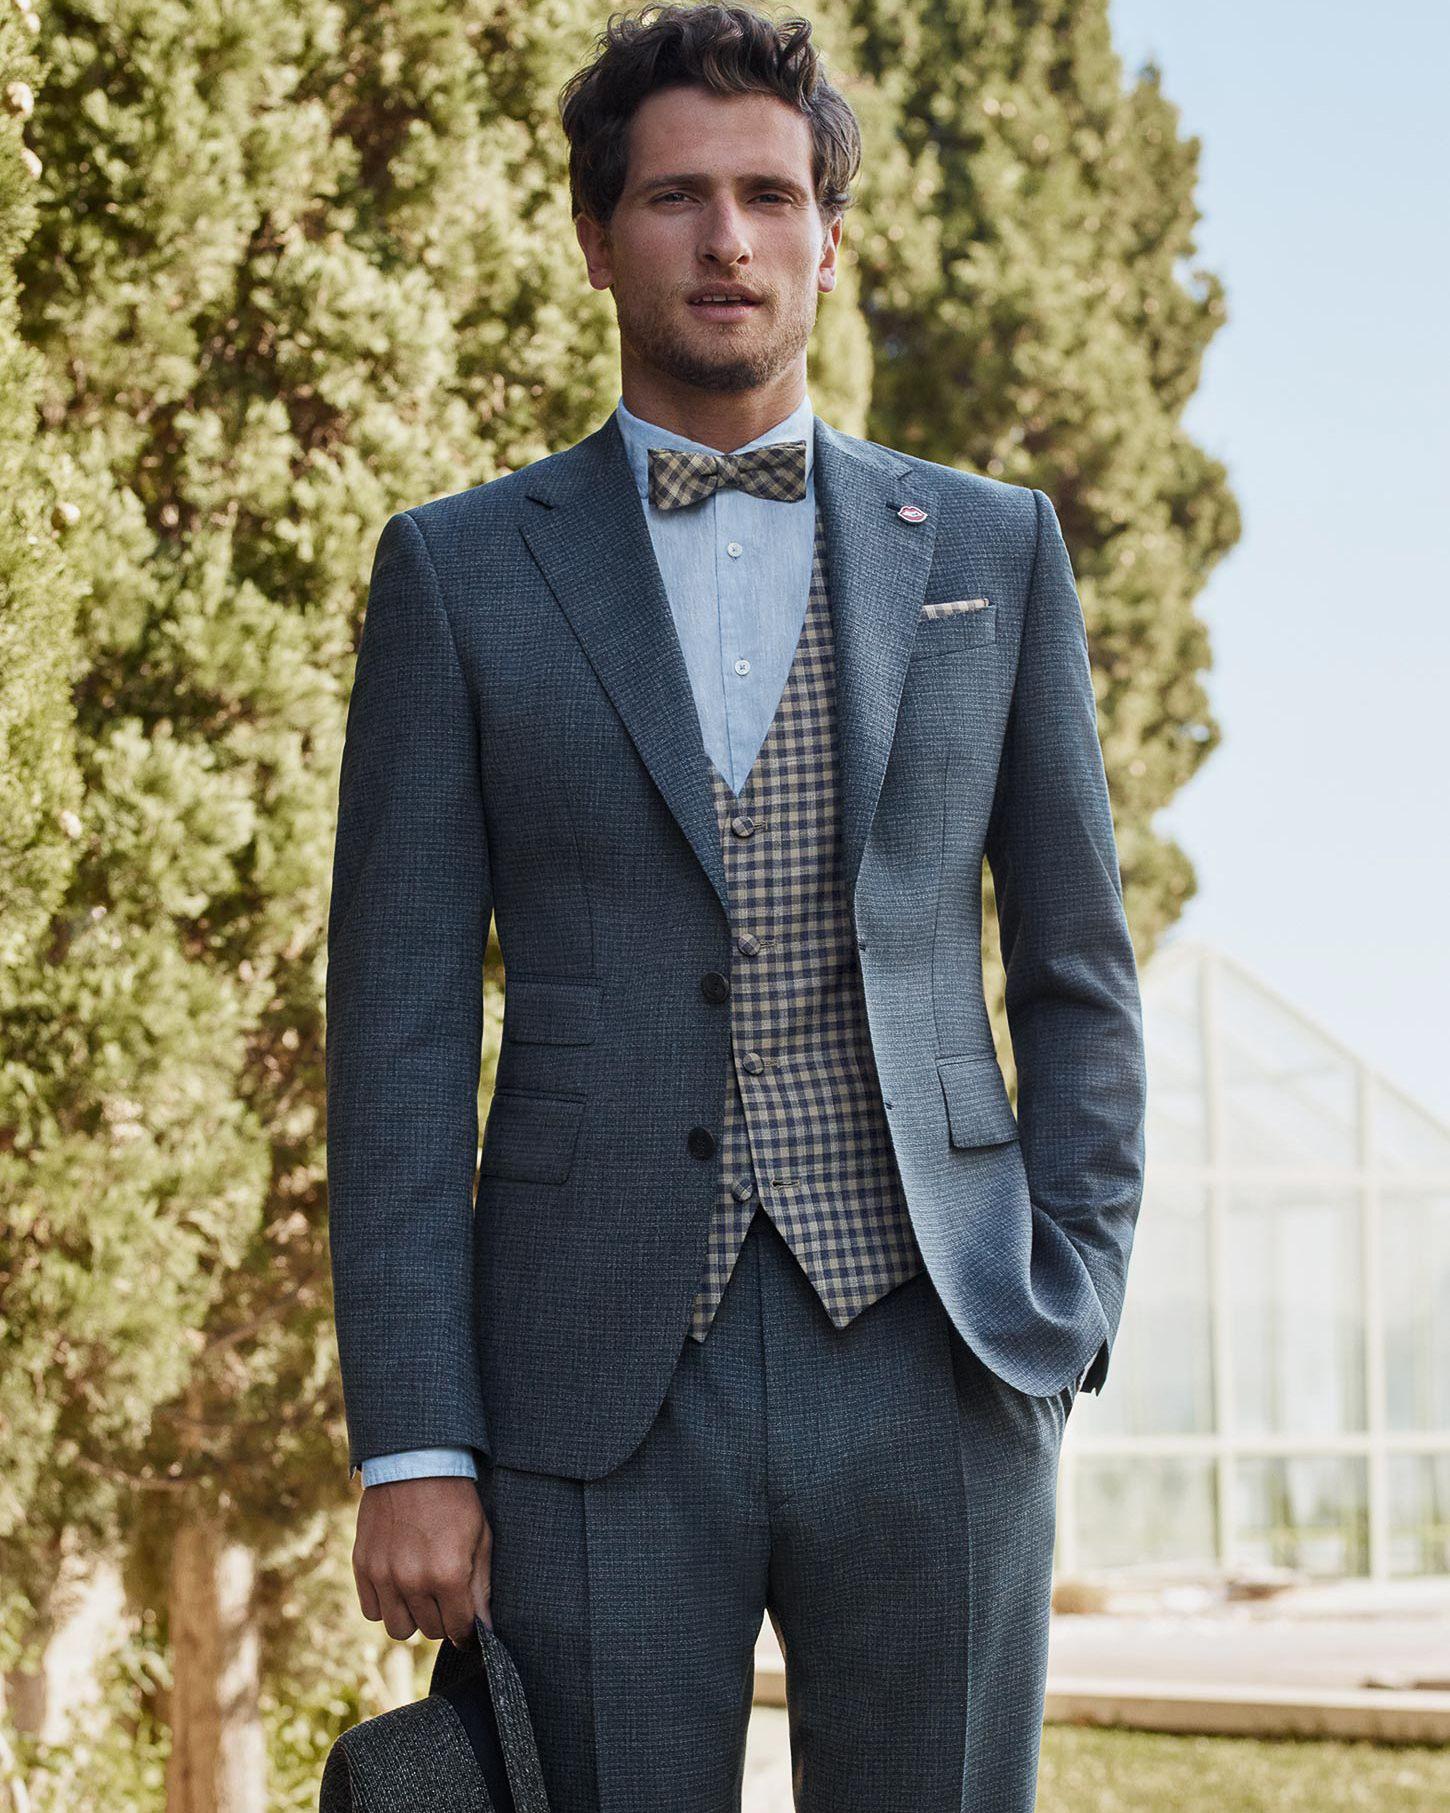 Vintage Anzug Für Den Bräutigam  Digel  Digel Anzug